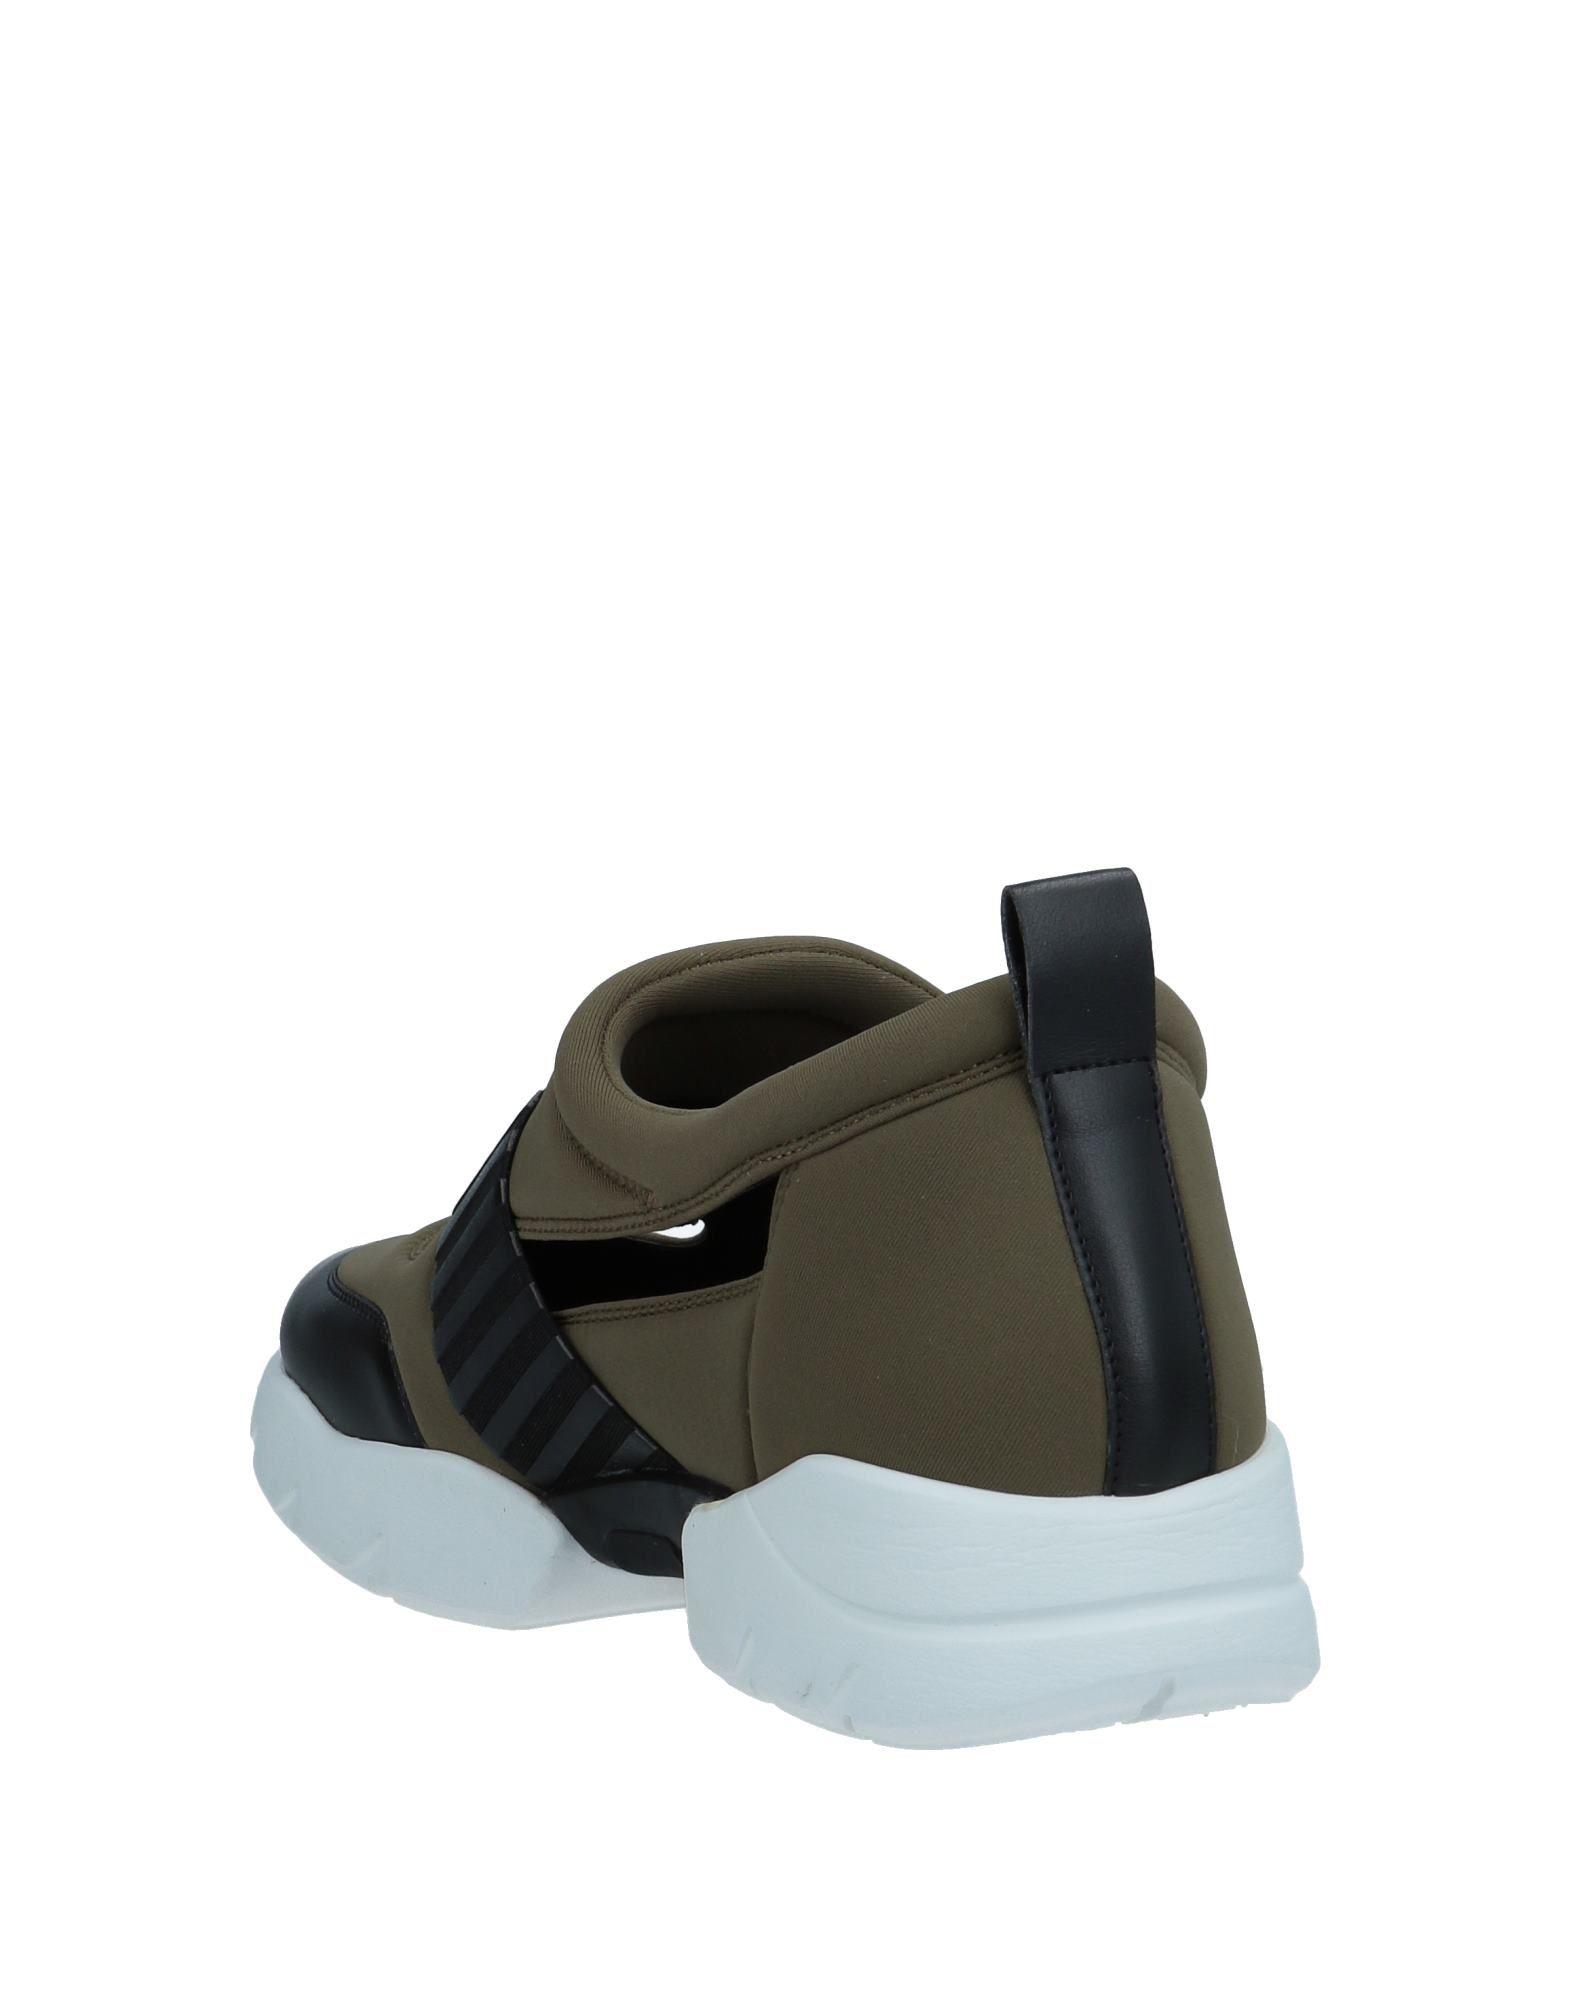 Stilvolle Sneakers billige Schuhe Grau Mer Sneakers Stilvolle Damen  11560297NV 8ef573